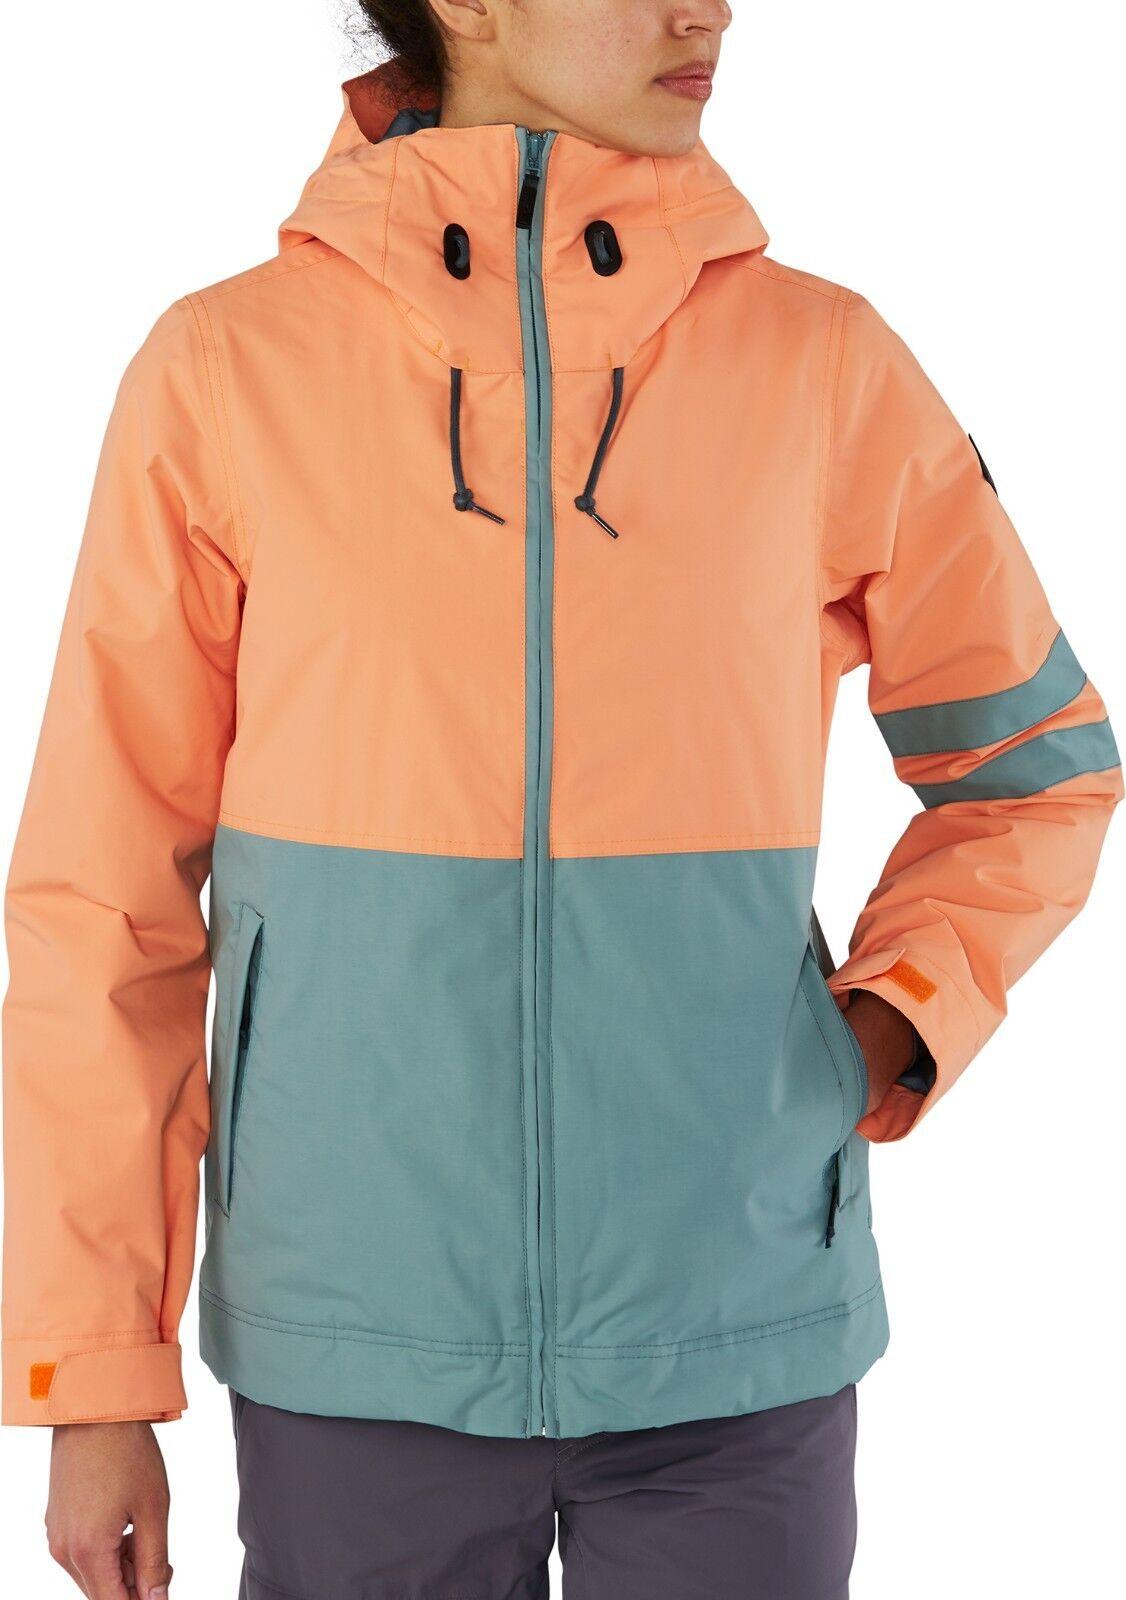 Dakine Juniper Damen Reißverschluss Vorne Snowboard Skijacke Skijacke Skijacke M Melon Neu 2019 1001b6